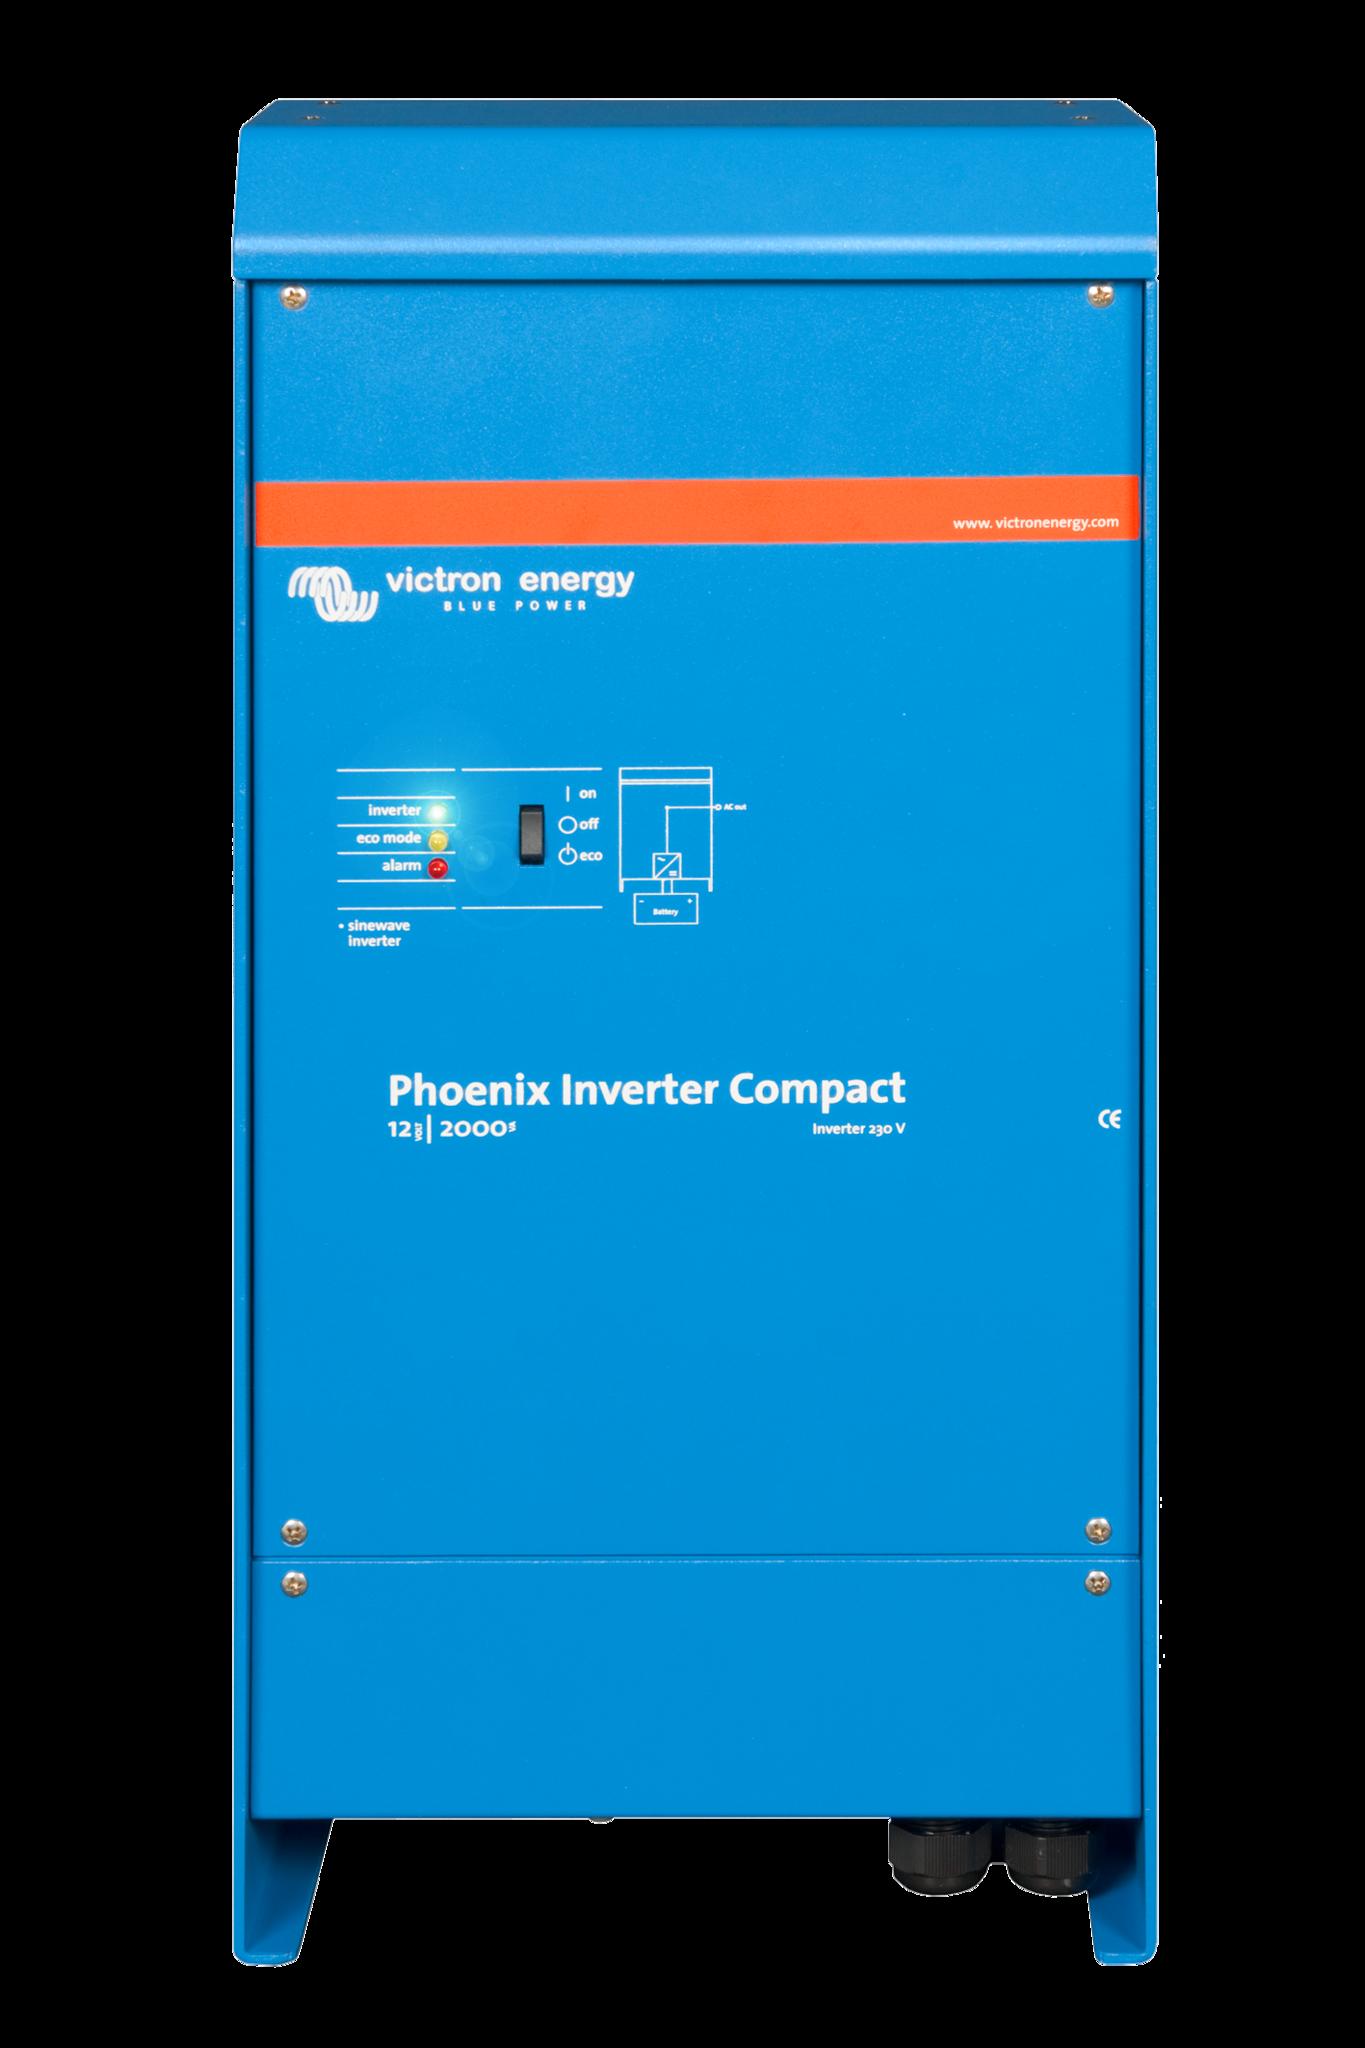 Phoenix Inverter Compact  24V